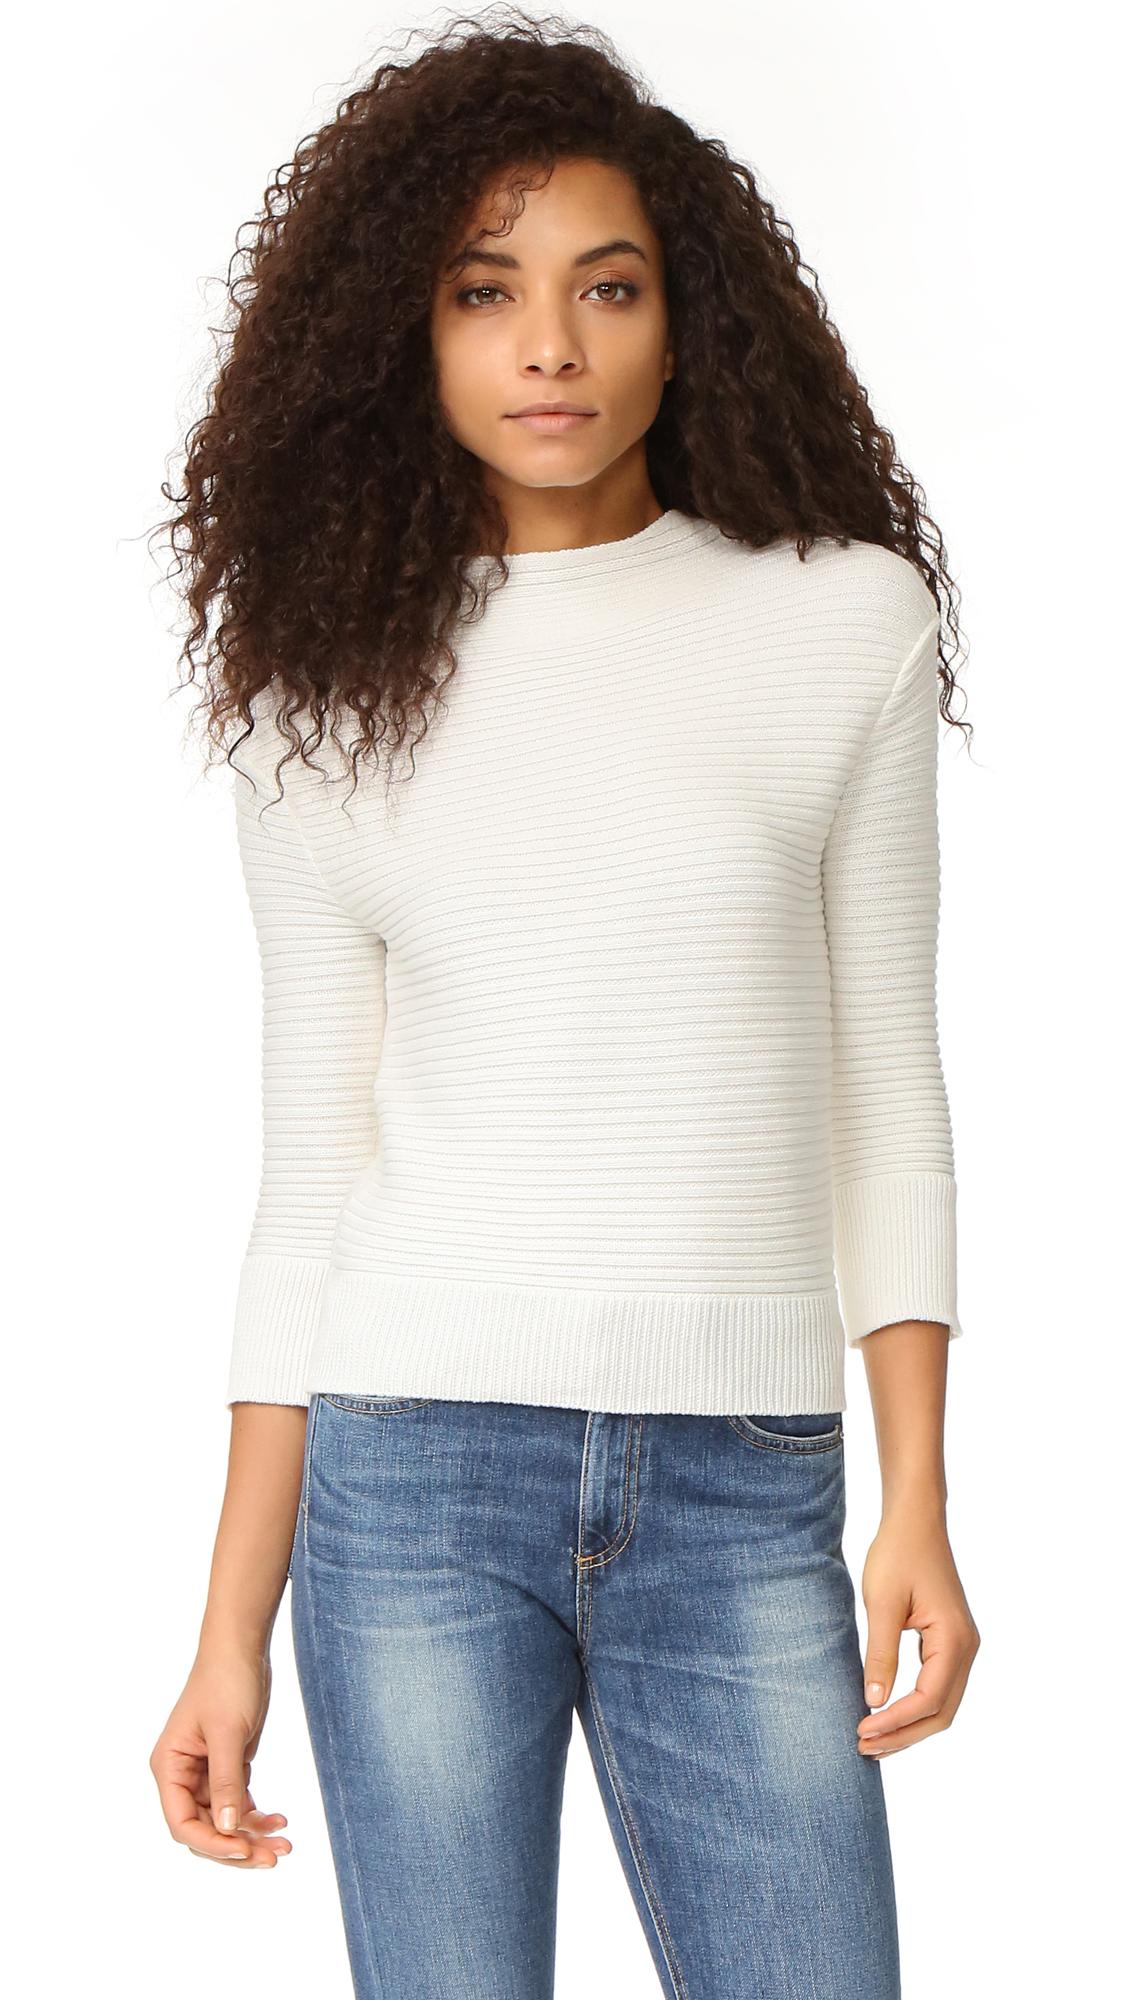 Ag Glove Sweater - Powder White at Shopbop